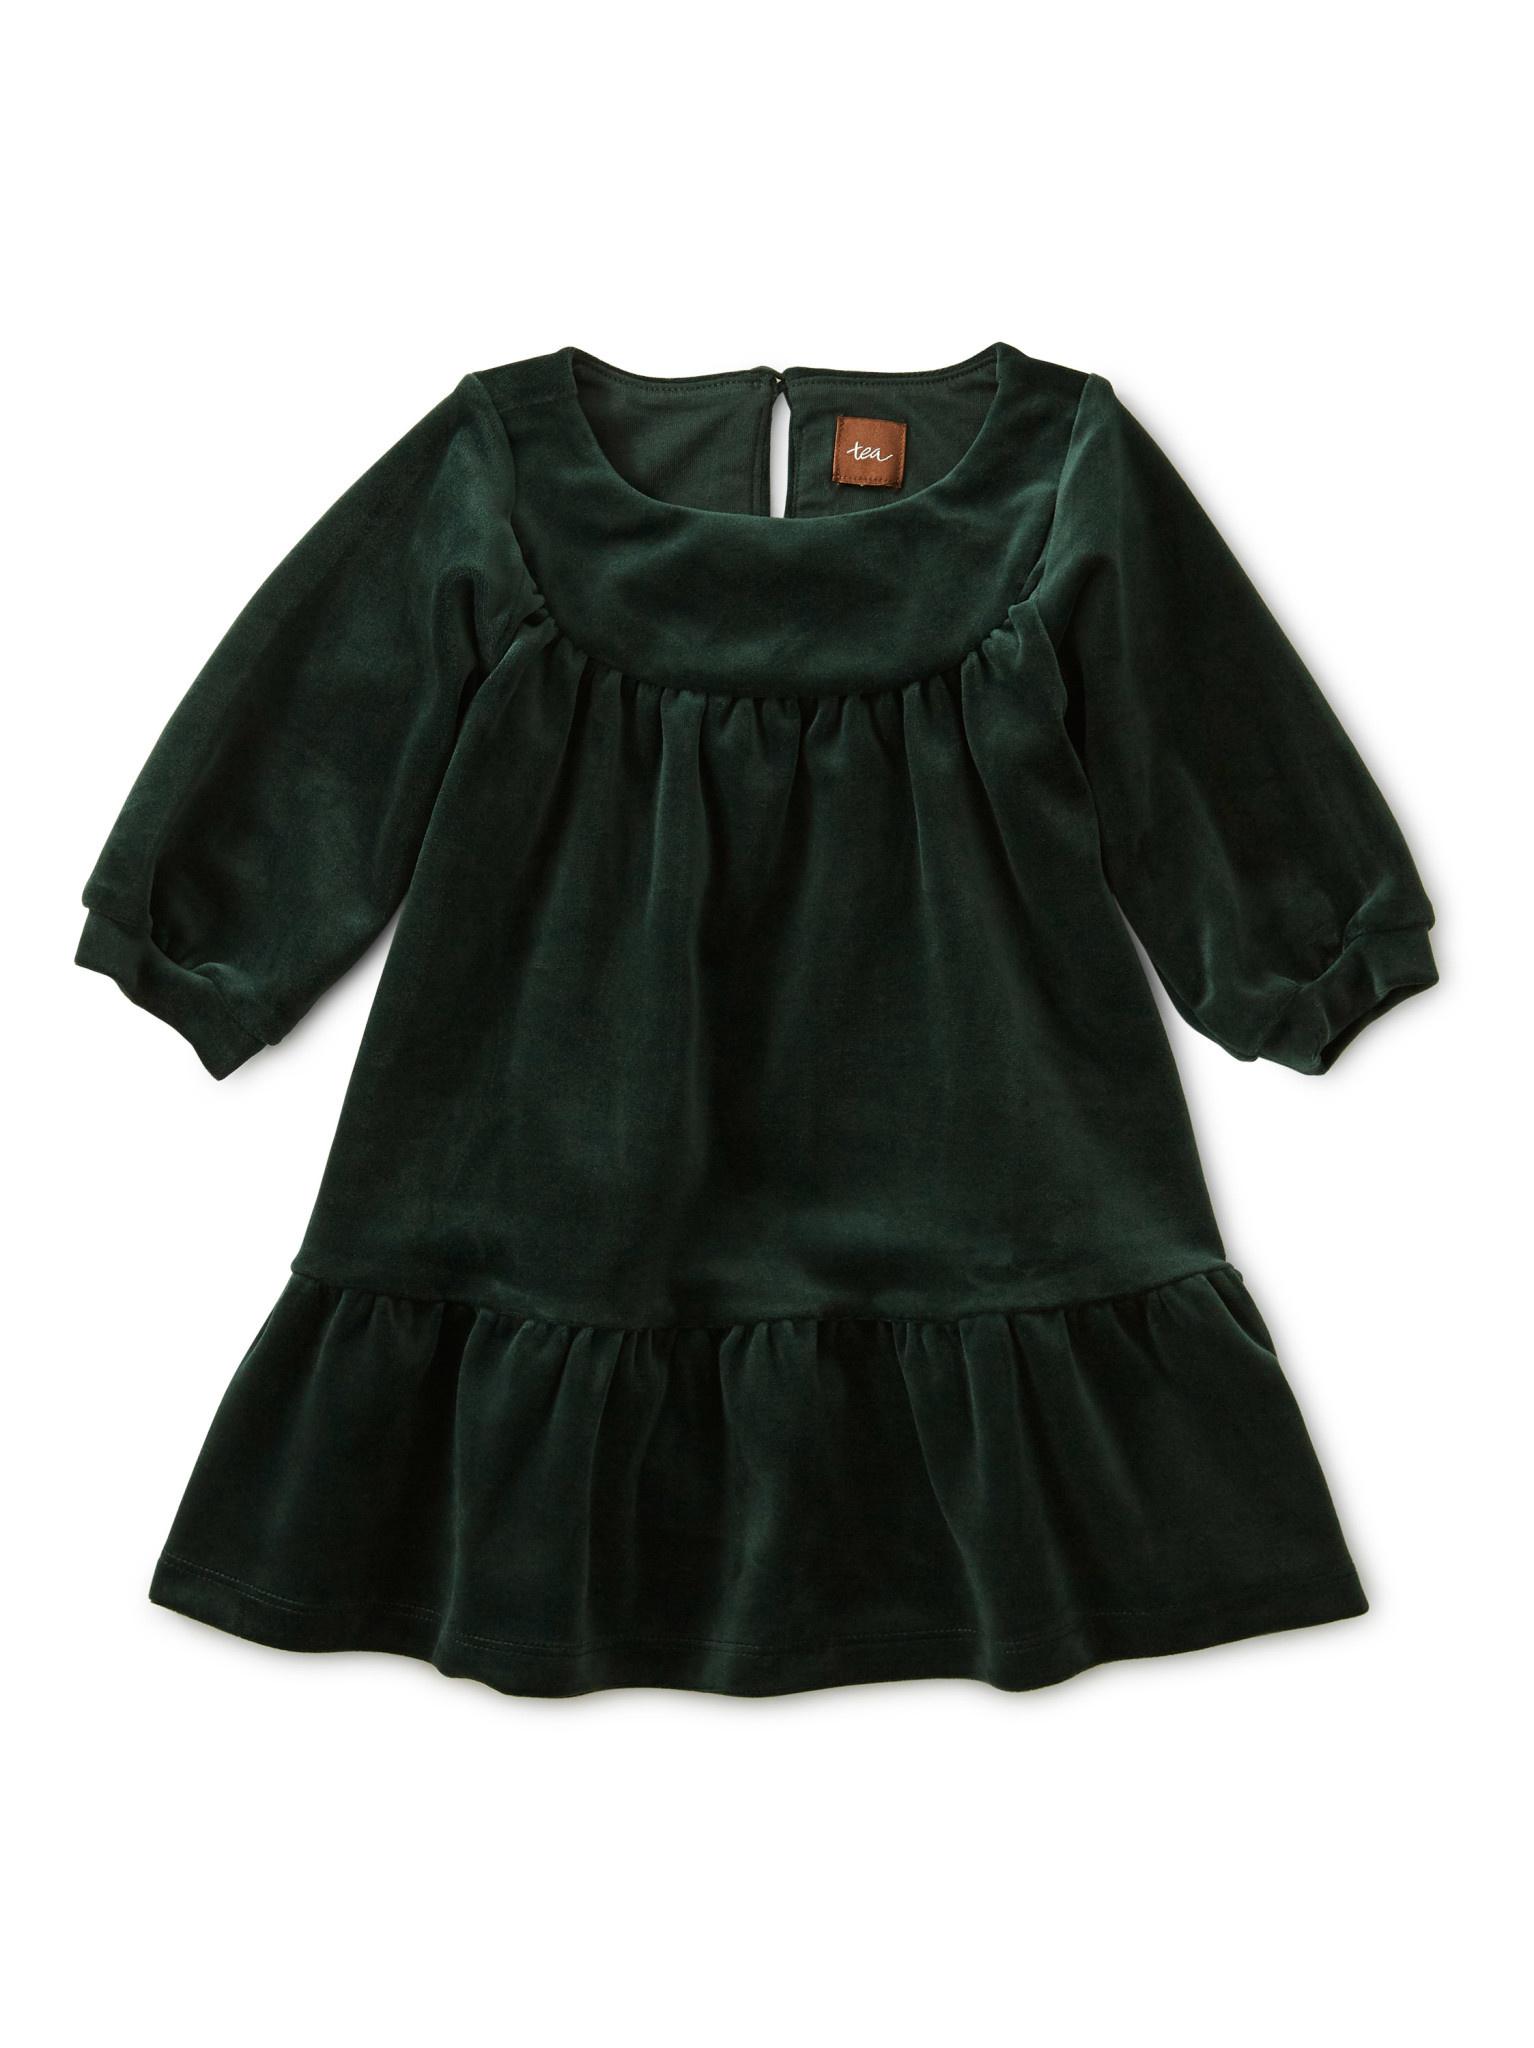 Tea Collection Velour Ruffle Baby Dress - Mallard